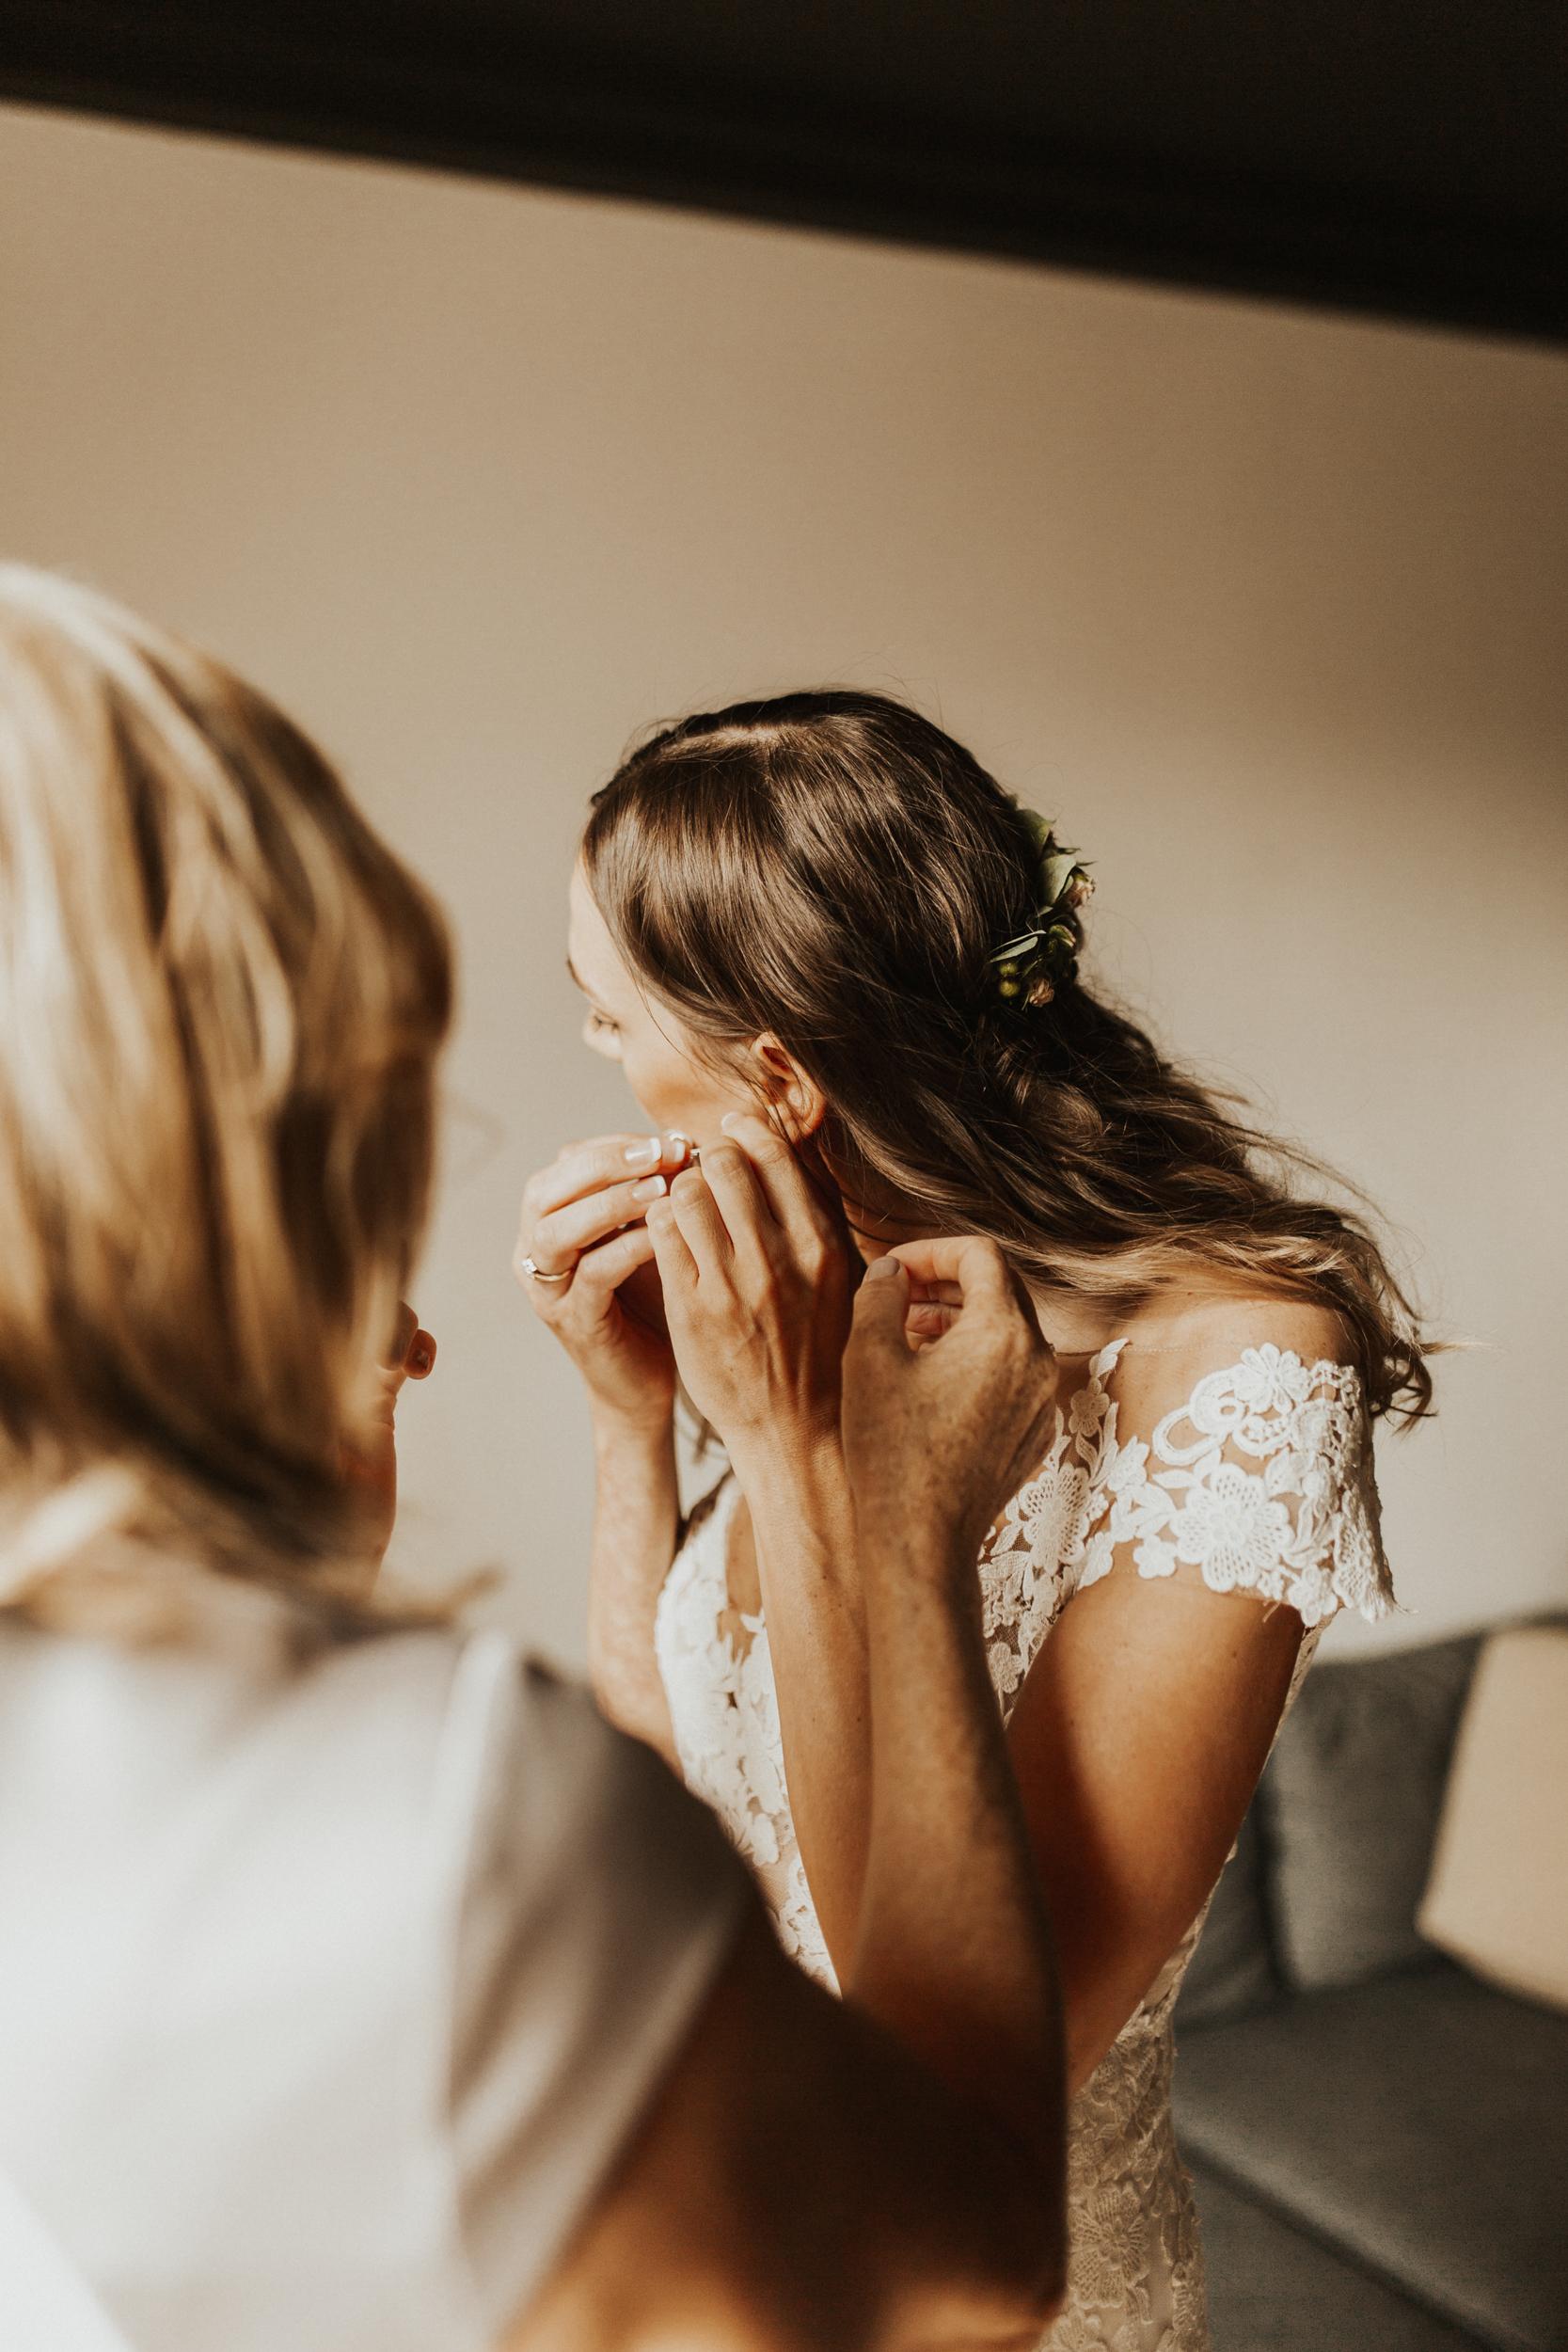 Laura-Benn-The-Asylum-London-The-Ace-Hotel-Wedding-Alternative-Darina-Stoda-Photography-50.jpg